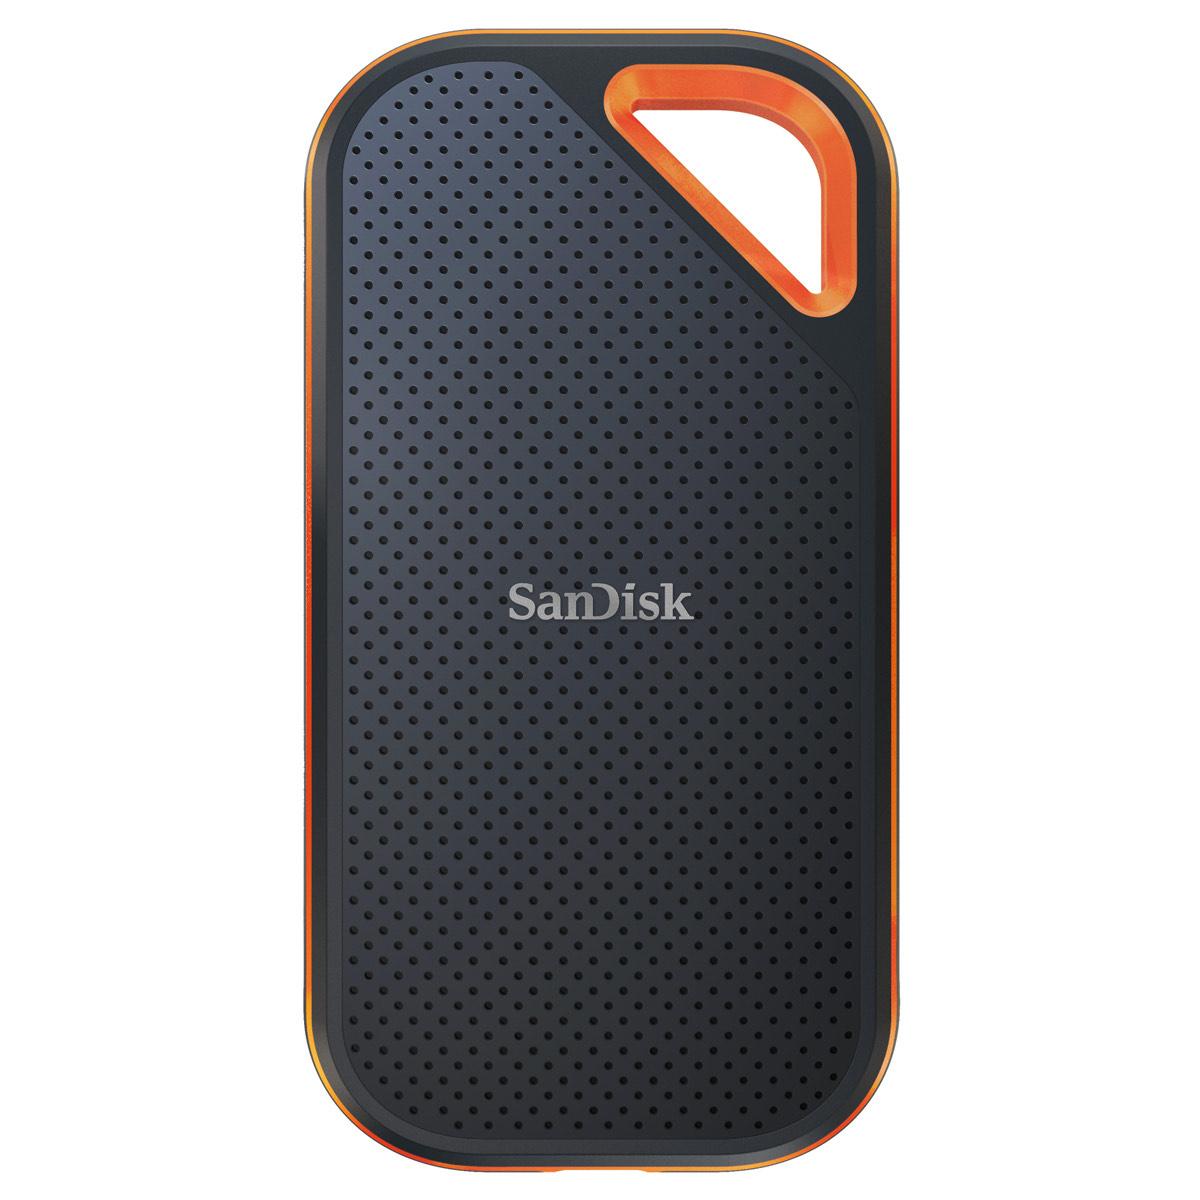 [eBay MediaMarkt] SANDISK Extreme PRO® Portable, 1 TB SSD, 2.5 Zoll, extern, Grau/Orange